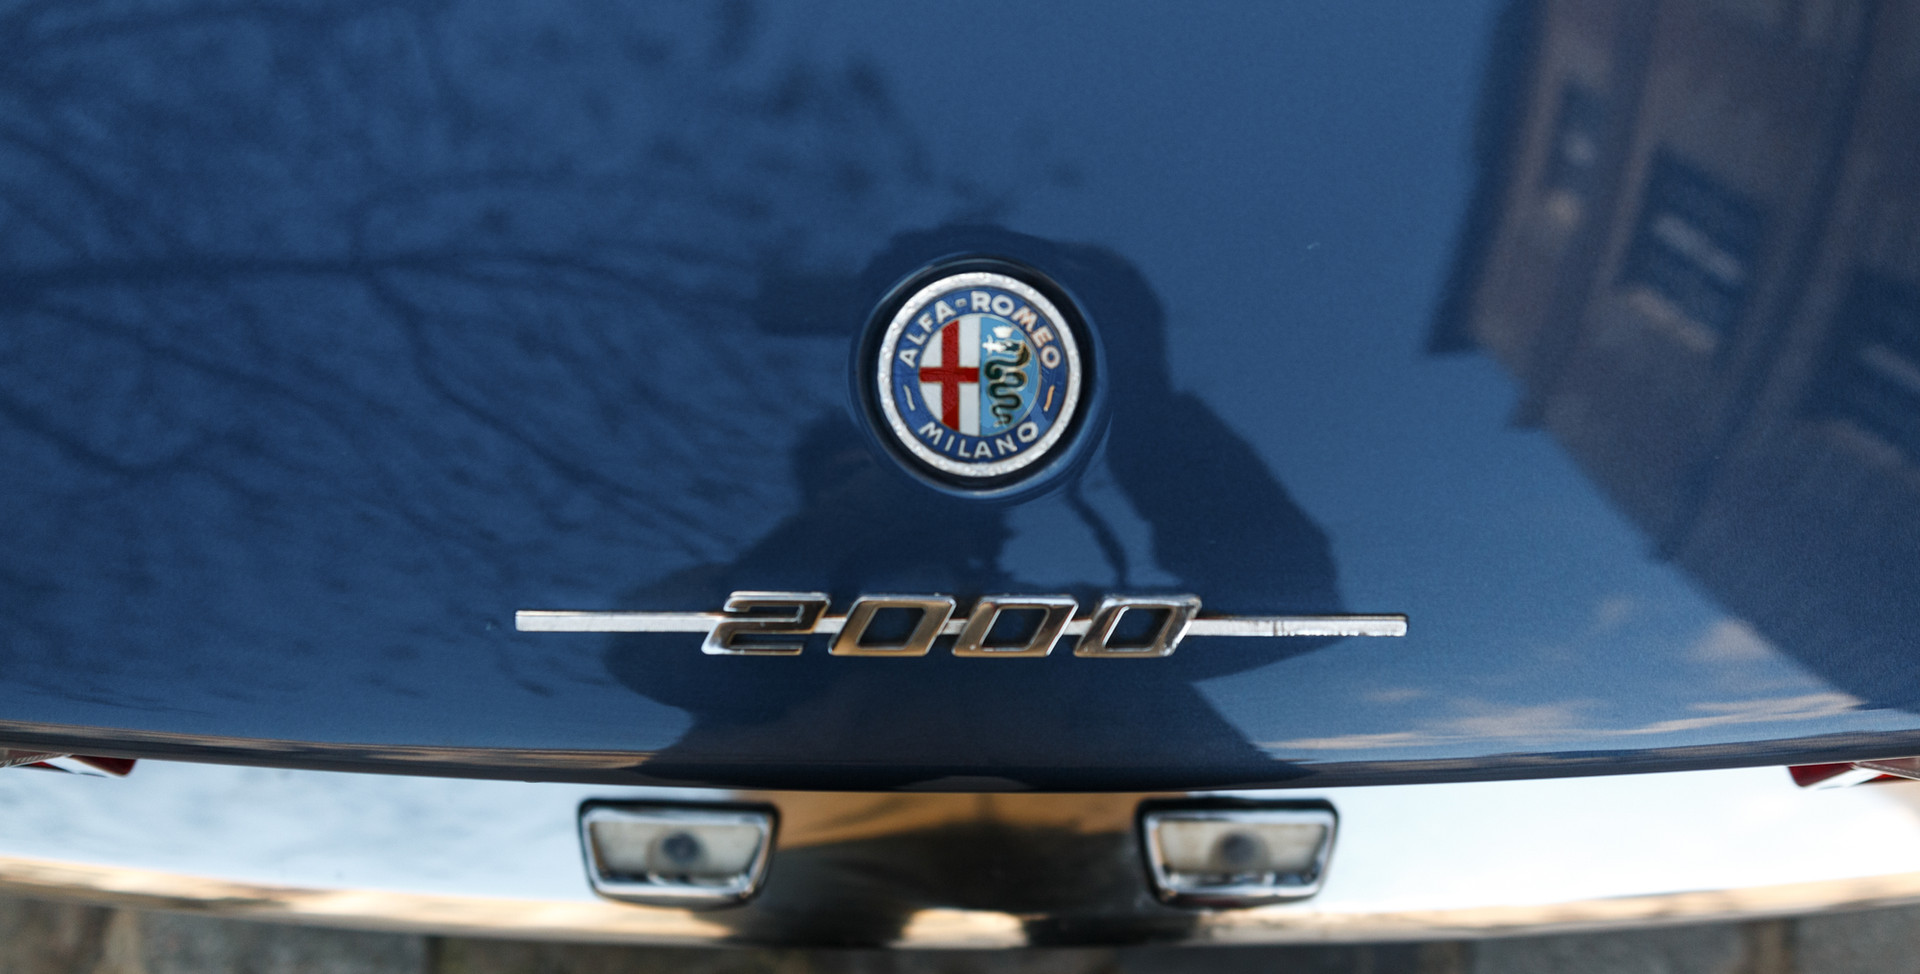 Alfa_Romeo_2000_détail_(13).jpg